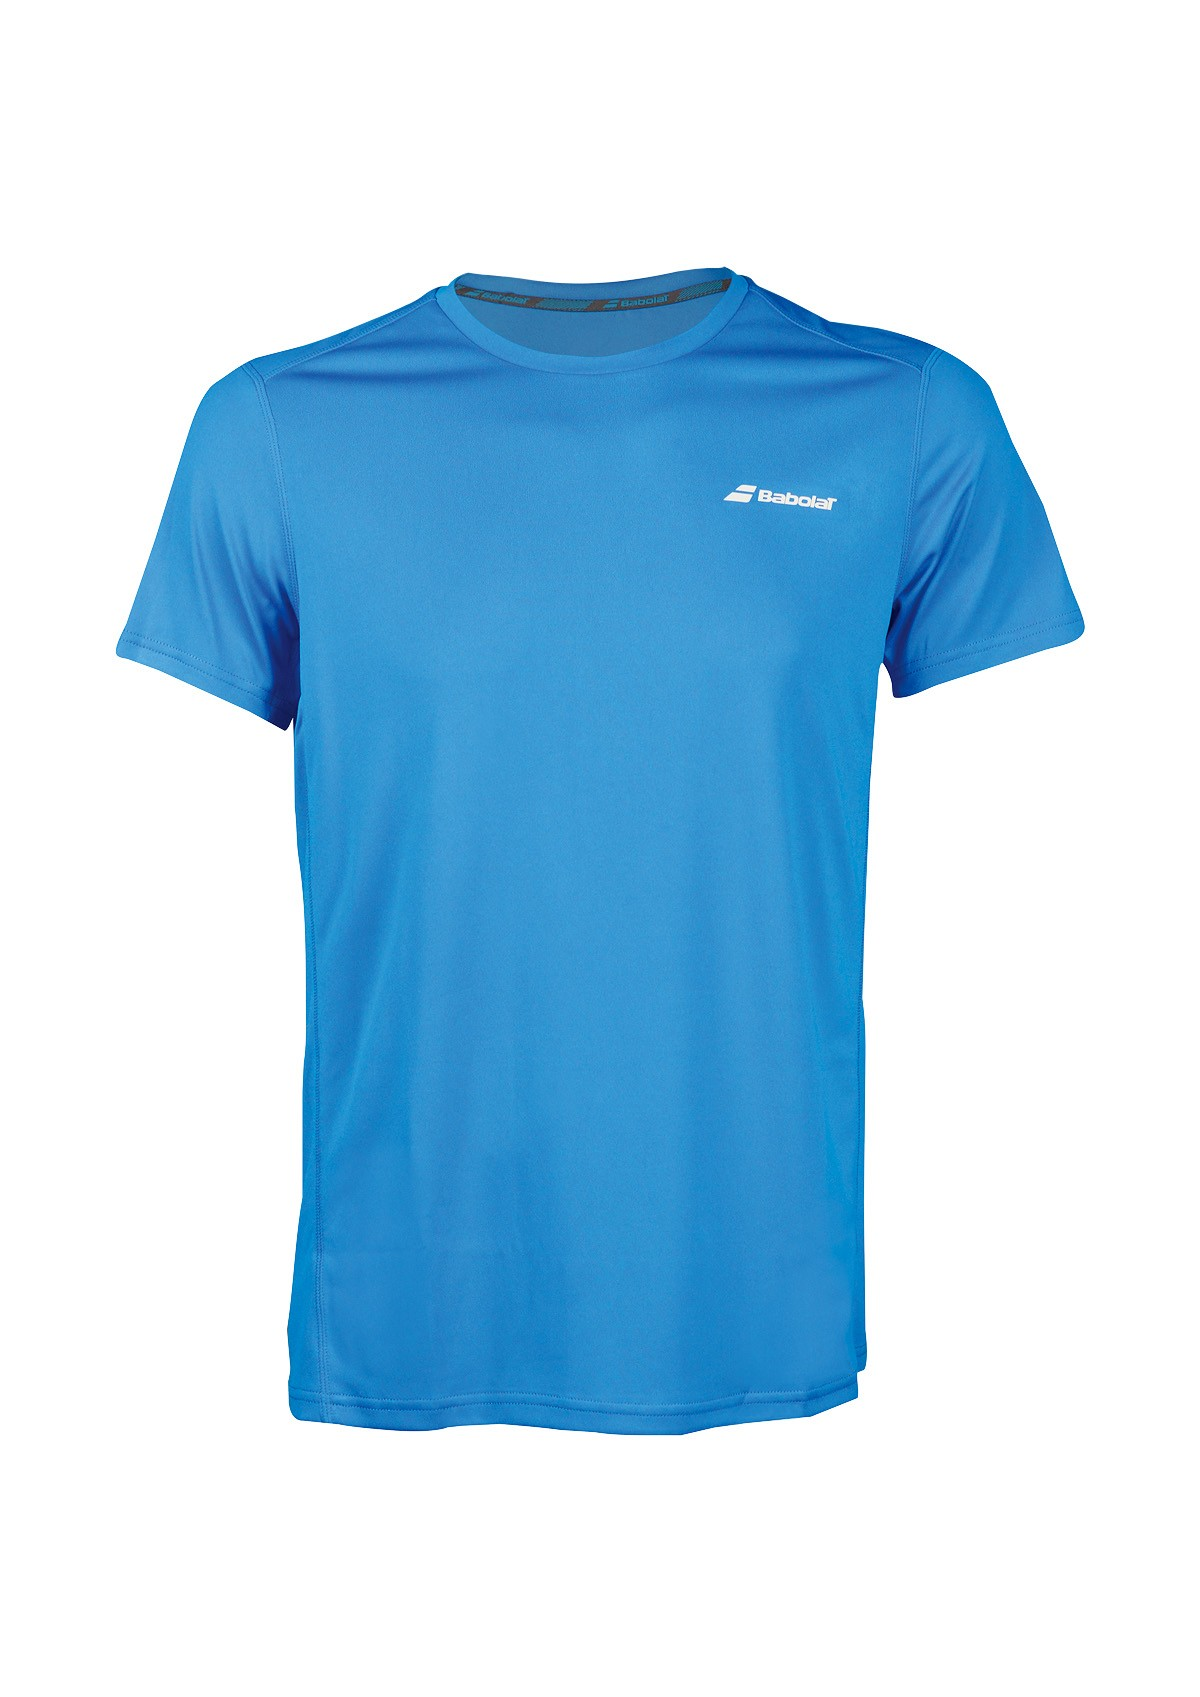 Koszulka tenisowa Babolat CORE T-shirt Blue - 45%